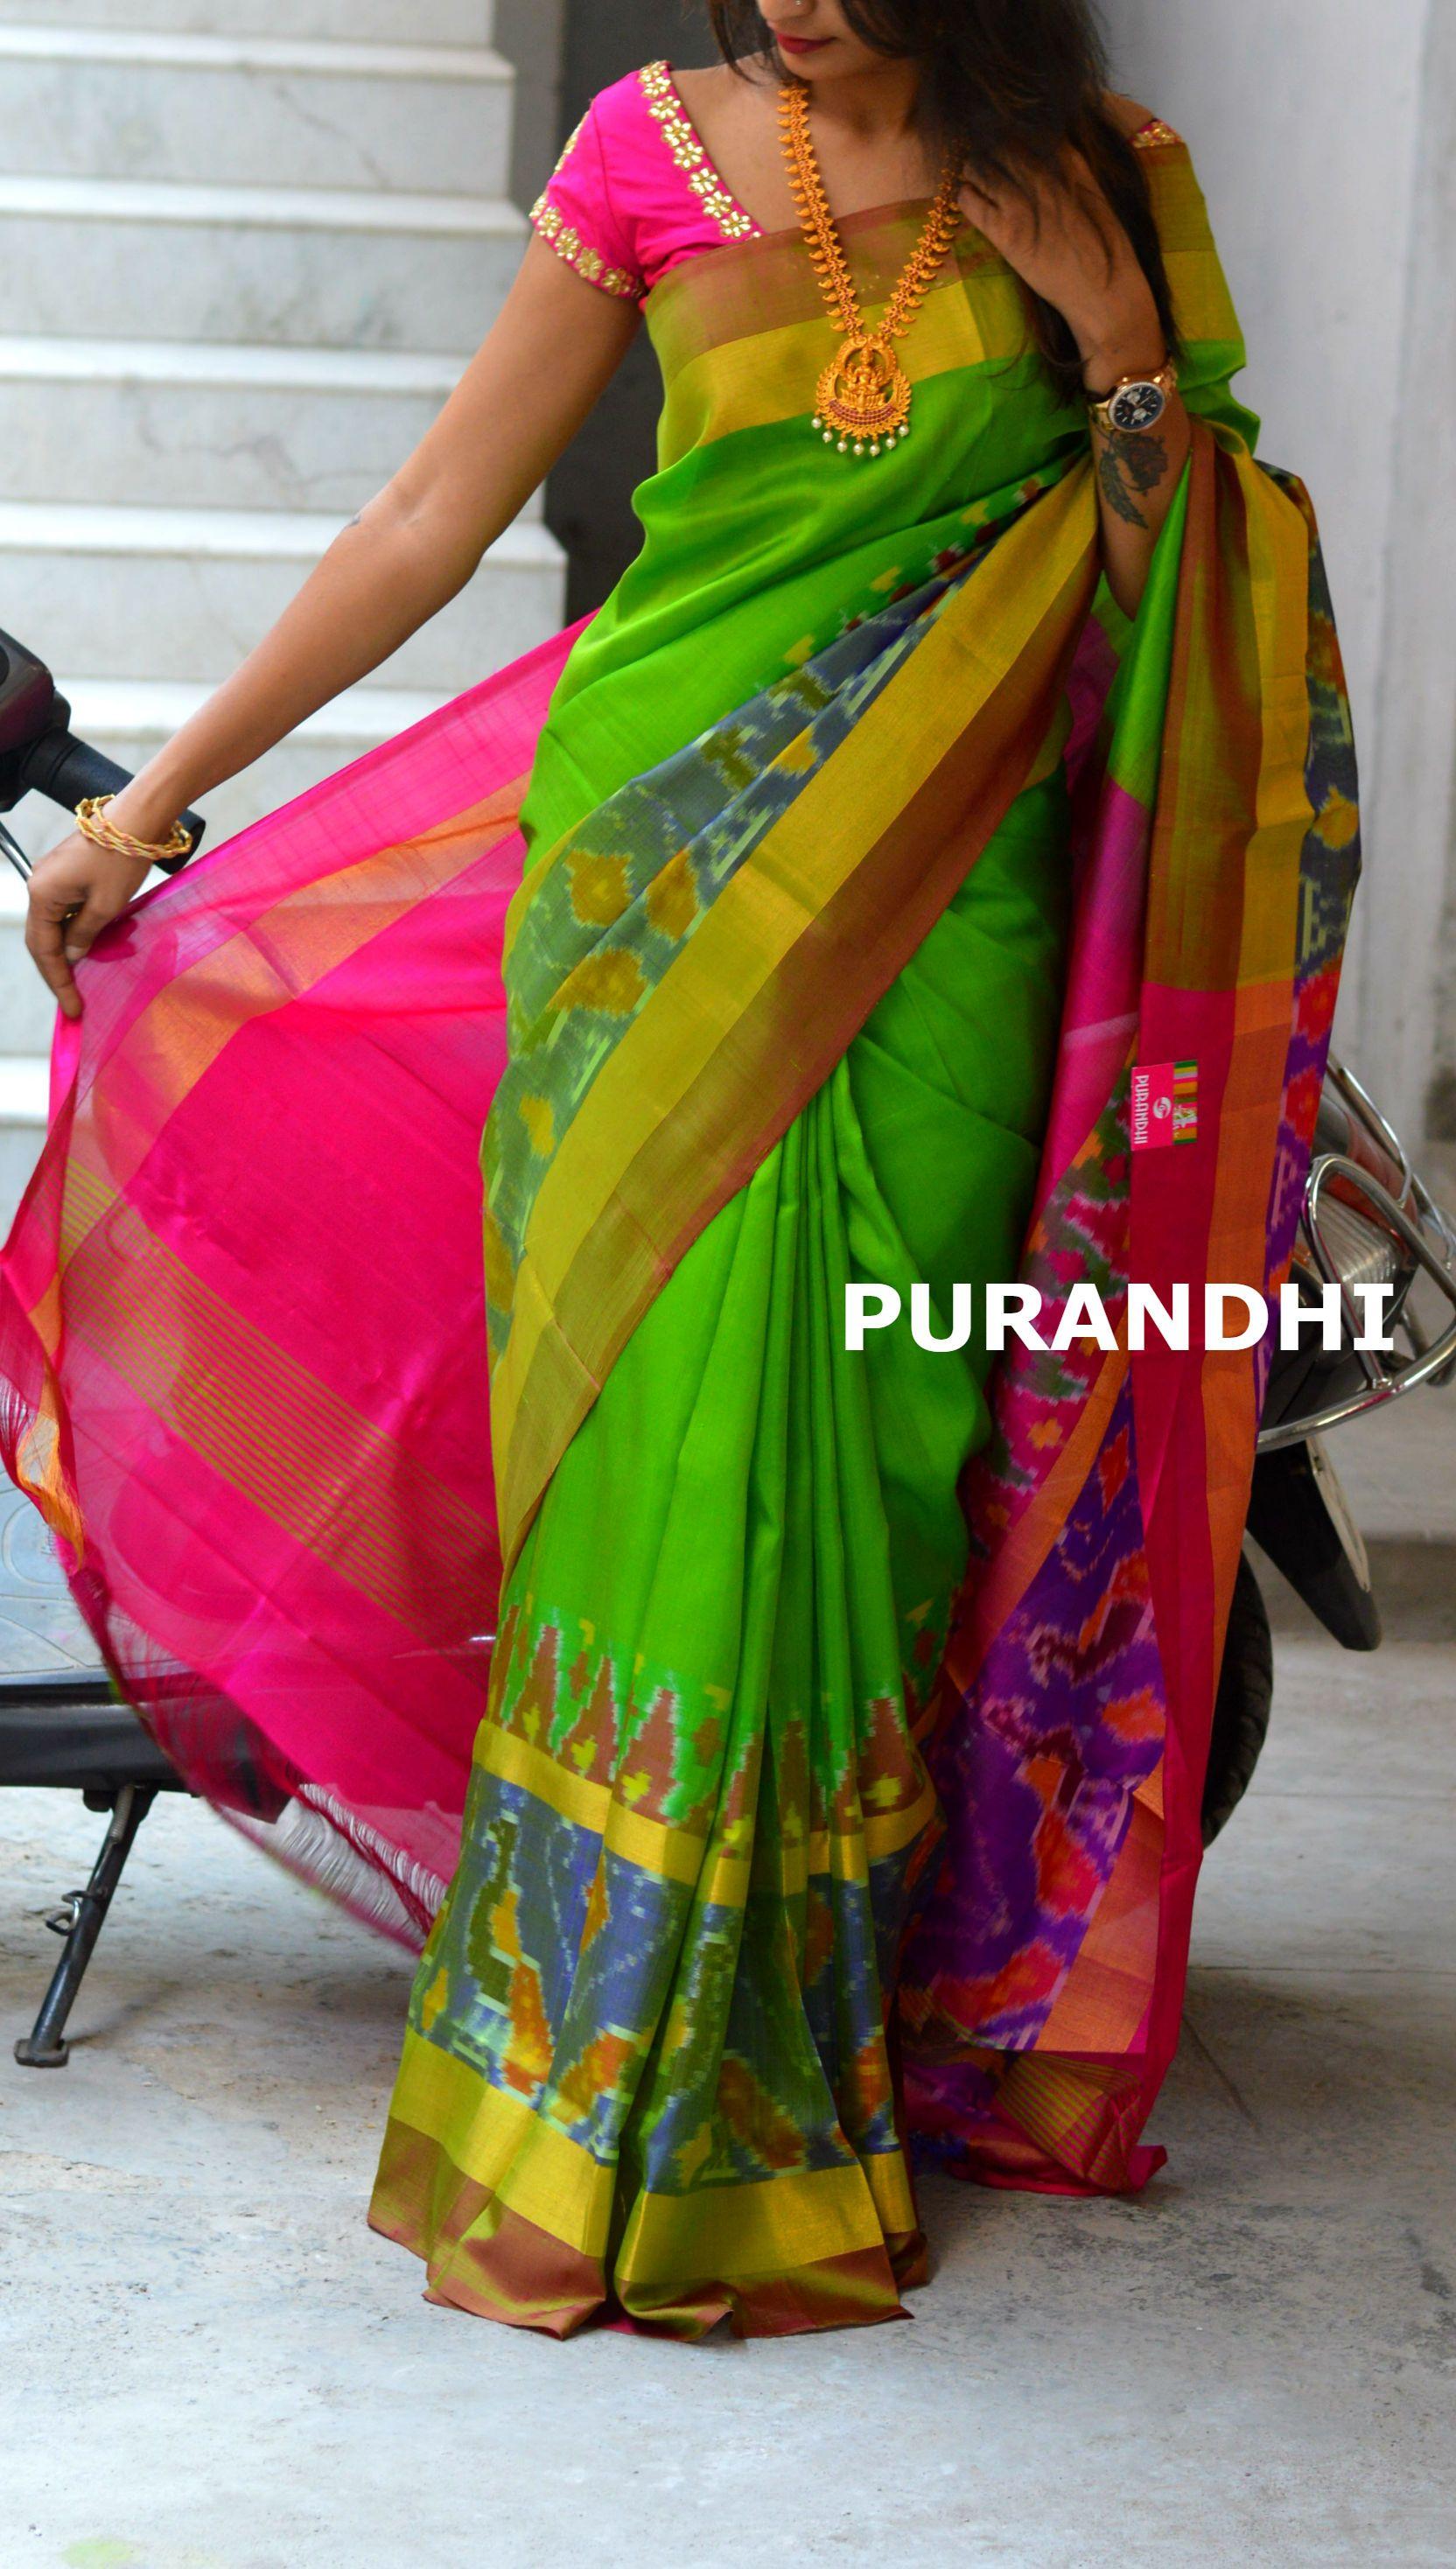 e516e931000555 Parrot green uppada checks saree with pochampally border. For more details  please contact us on whats app   9701673187 Email   purandhistore gmail.com